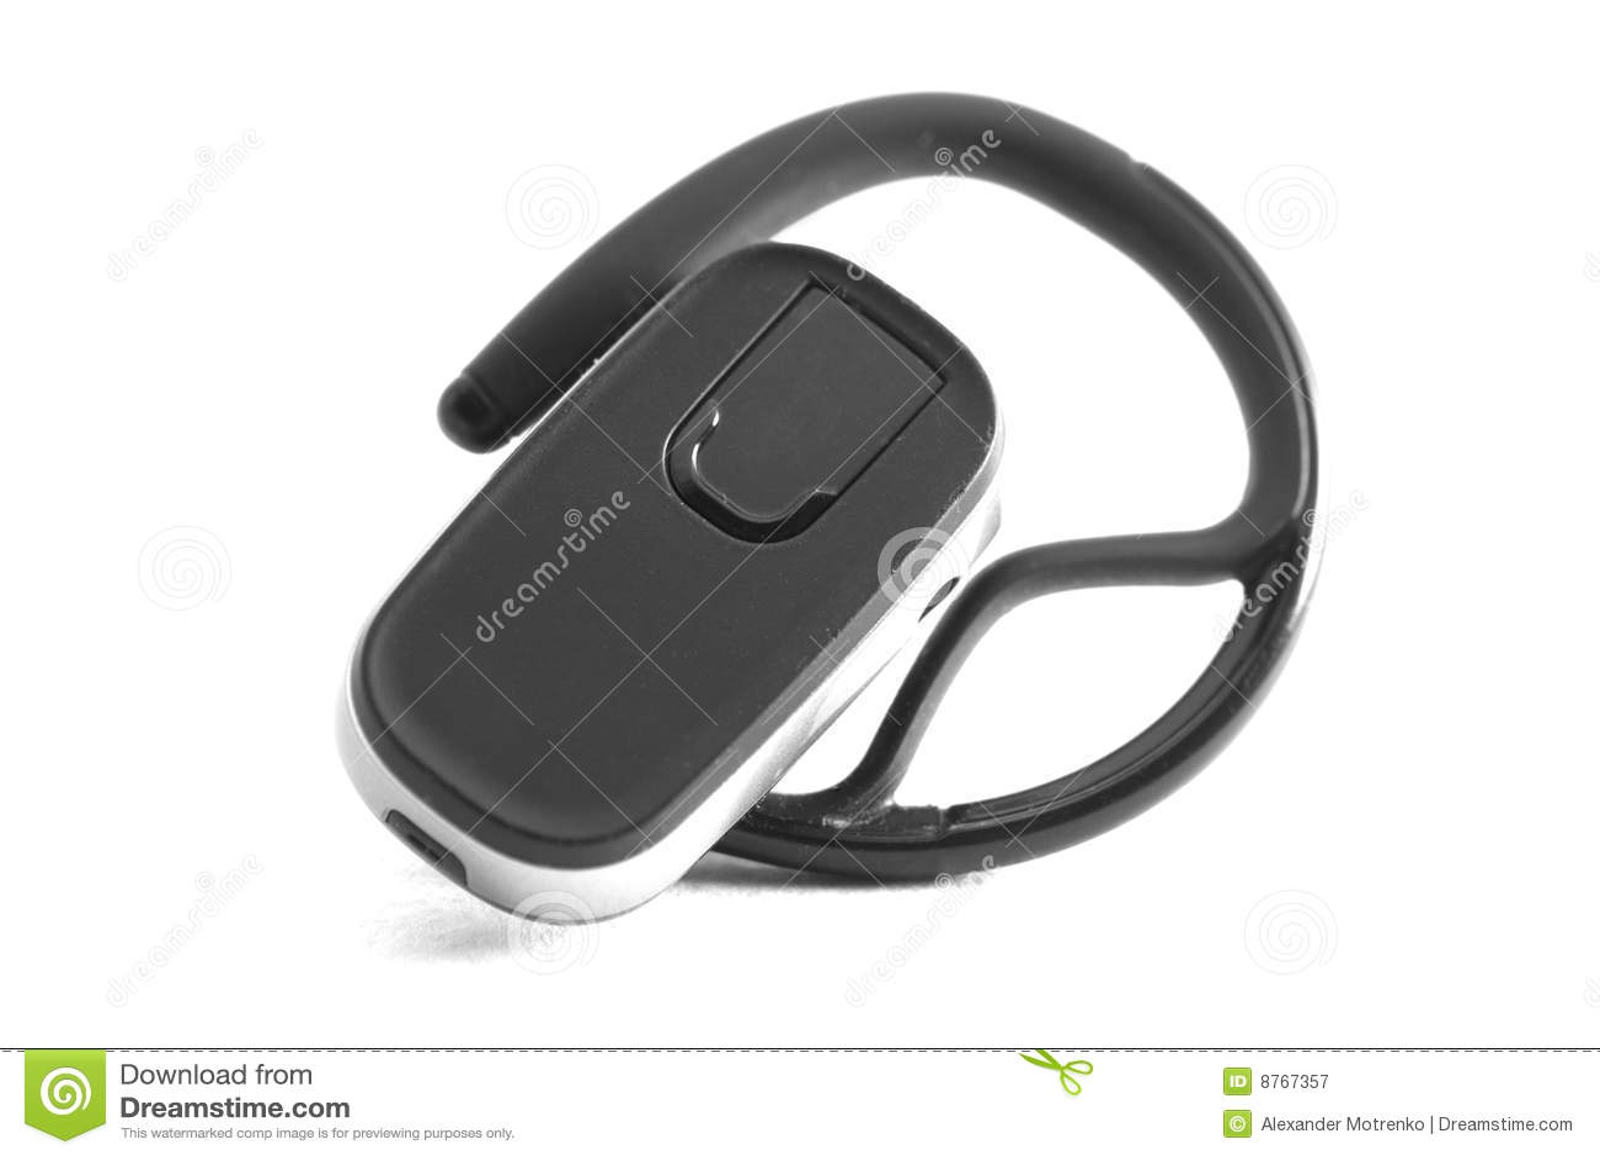 Bluetooth Handsfree device